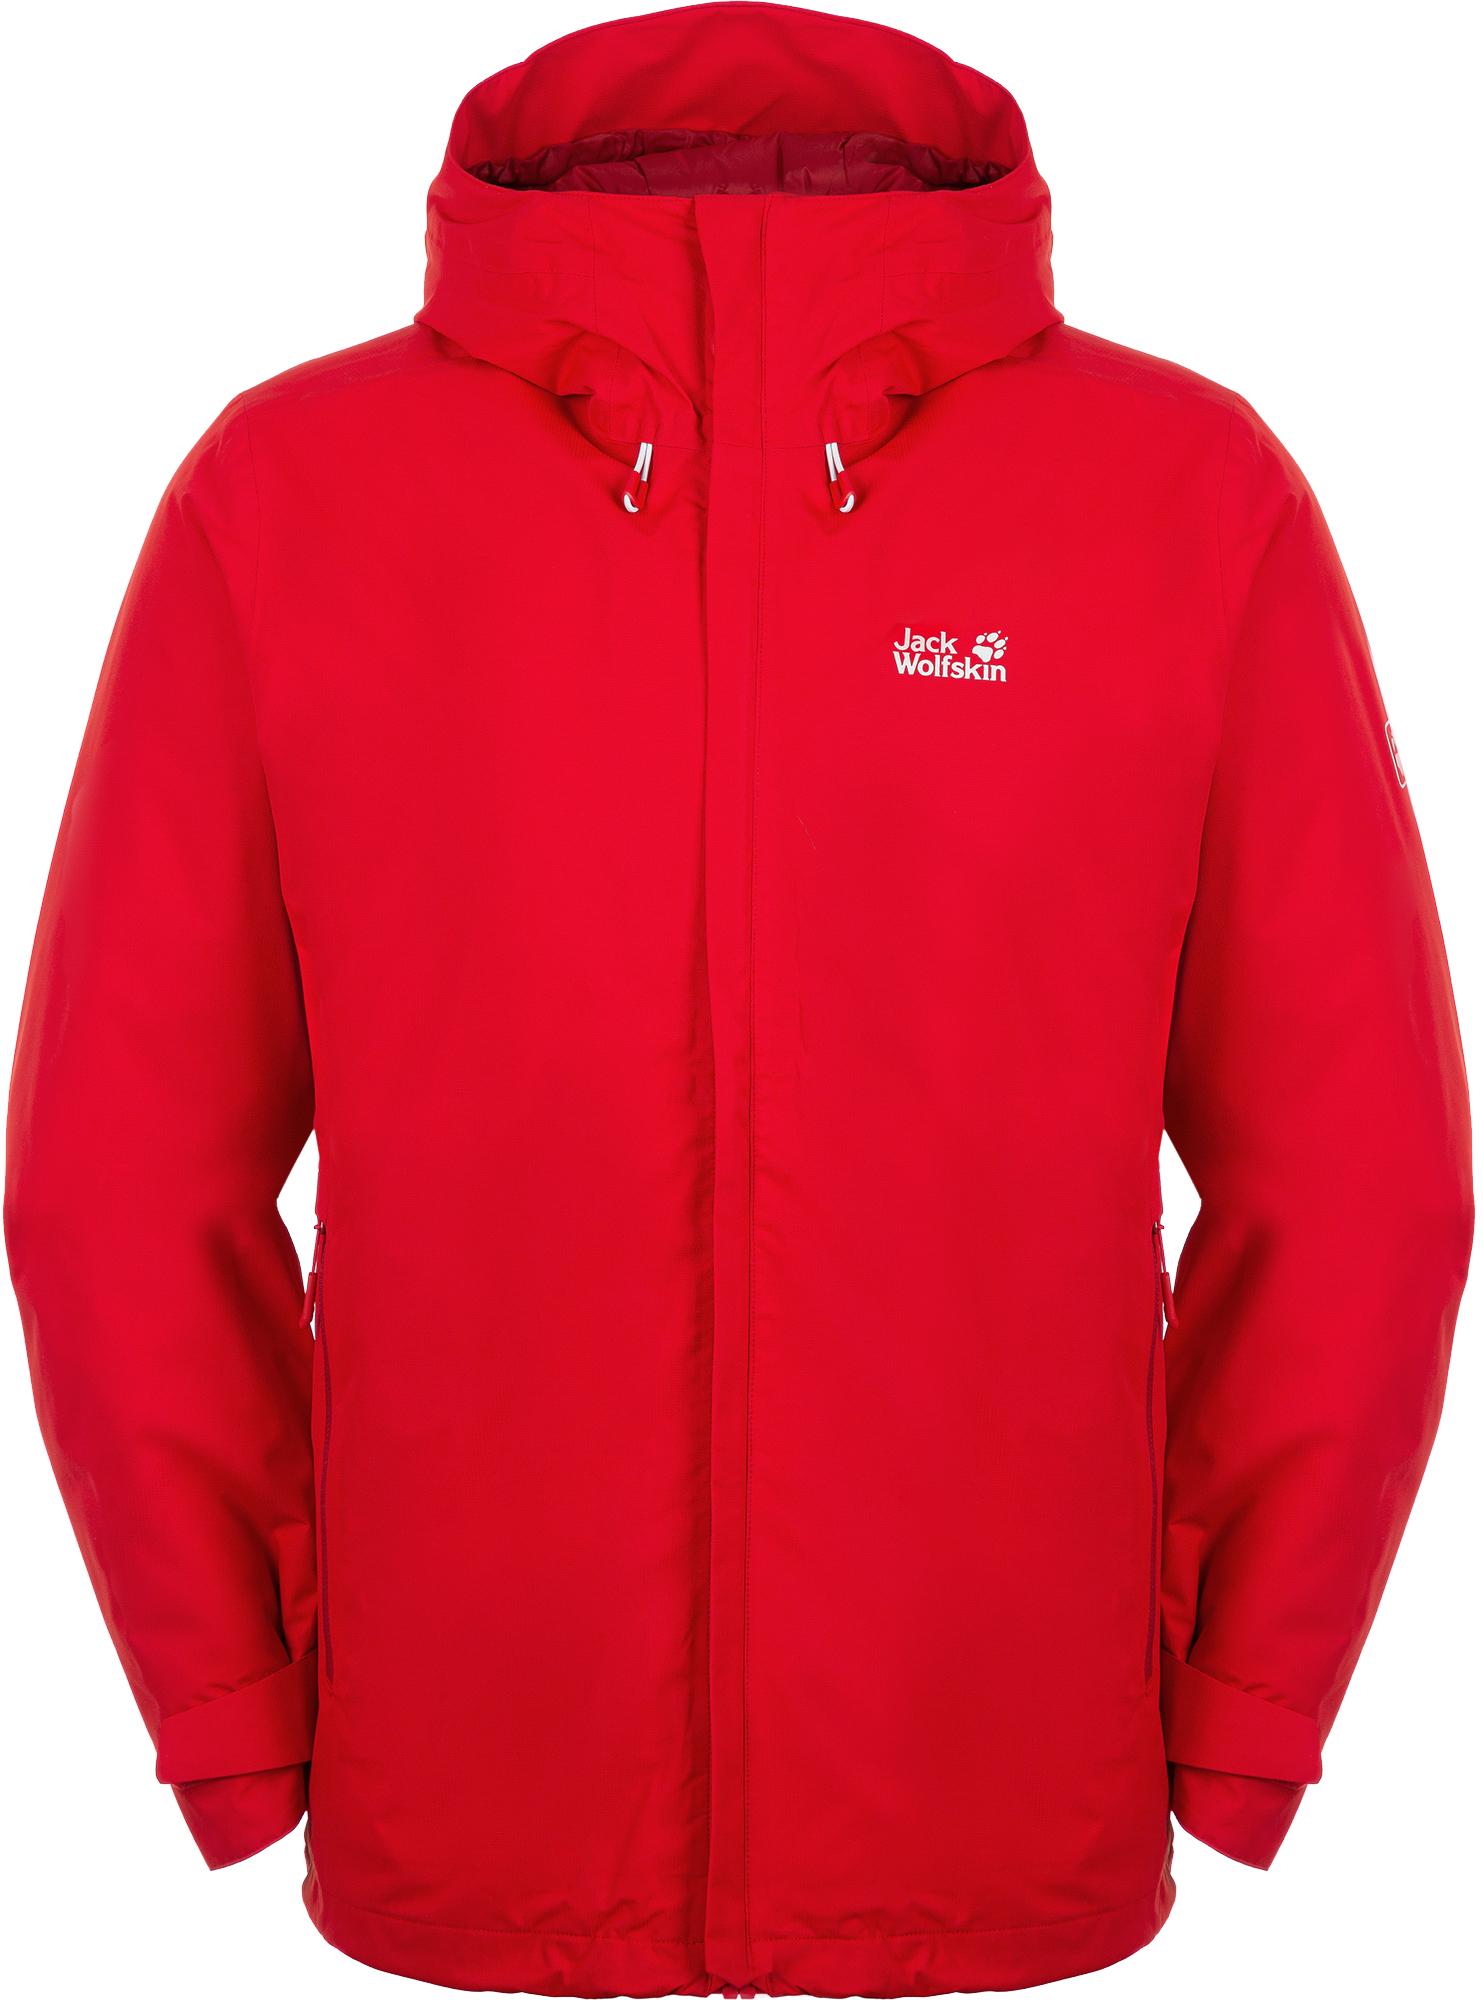 JACK WOLFSKIN Куртка утепленная мужская Jack Wolfskin Argon Storm, размер 50-52